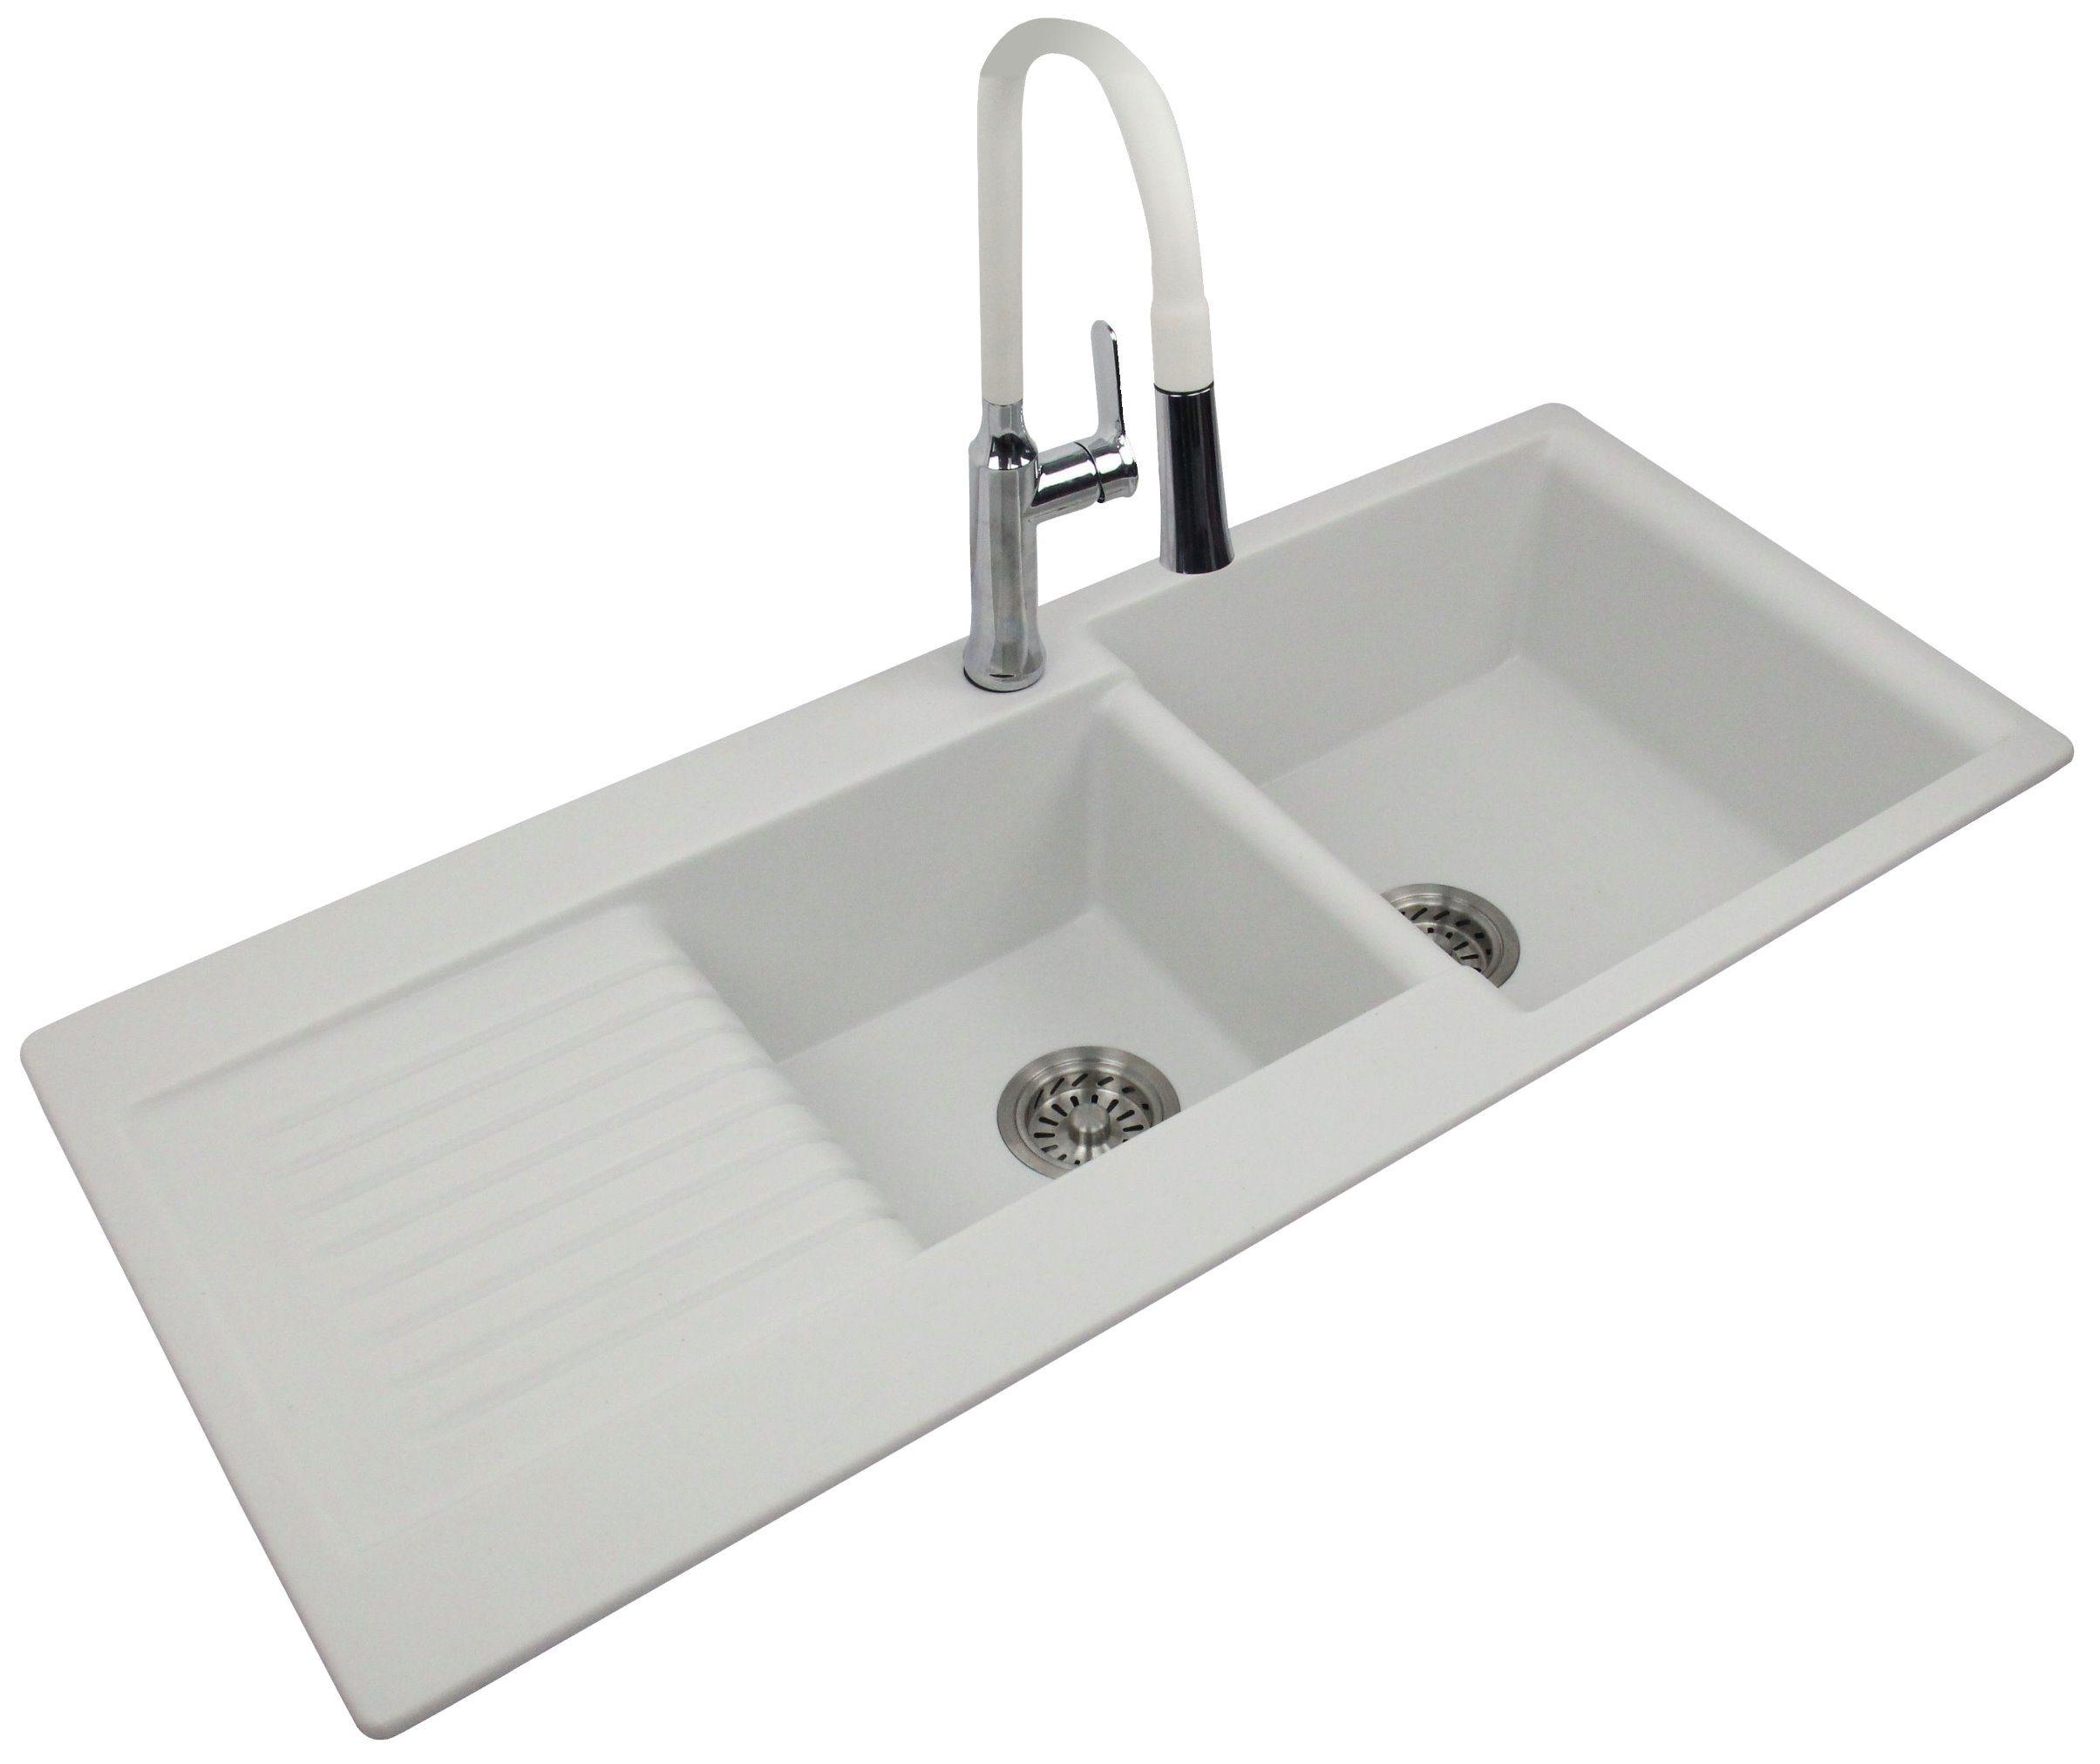 Image of: China Open Kitchen Best Granite Double Bowl With Drainboard China Quartz Stone Kitchen Sink Kitchen Sink